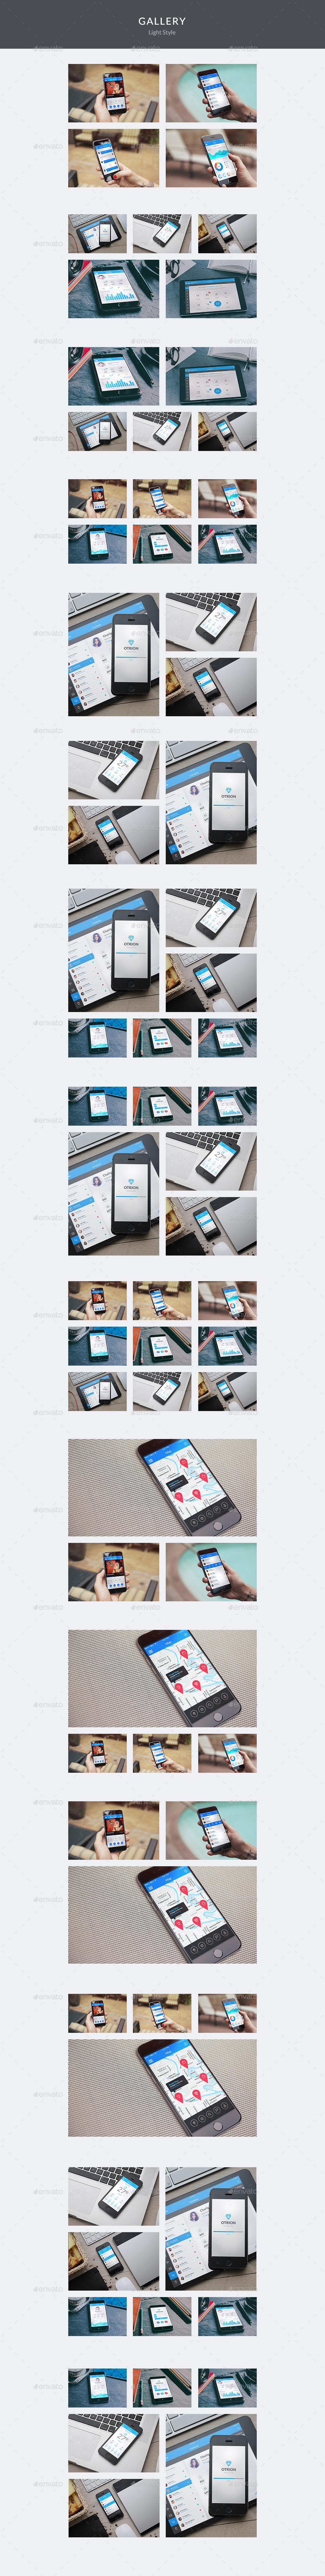 Otrion - E-mail Template Builder by MegyunkBoraBora | GraphicRiver